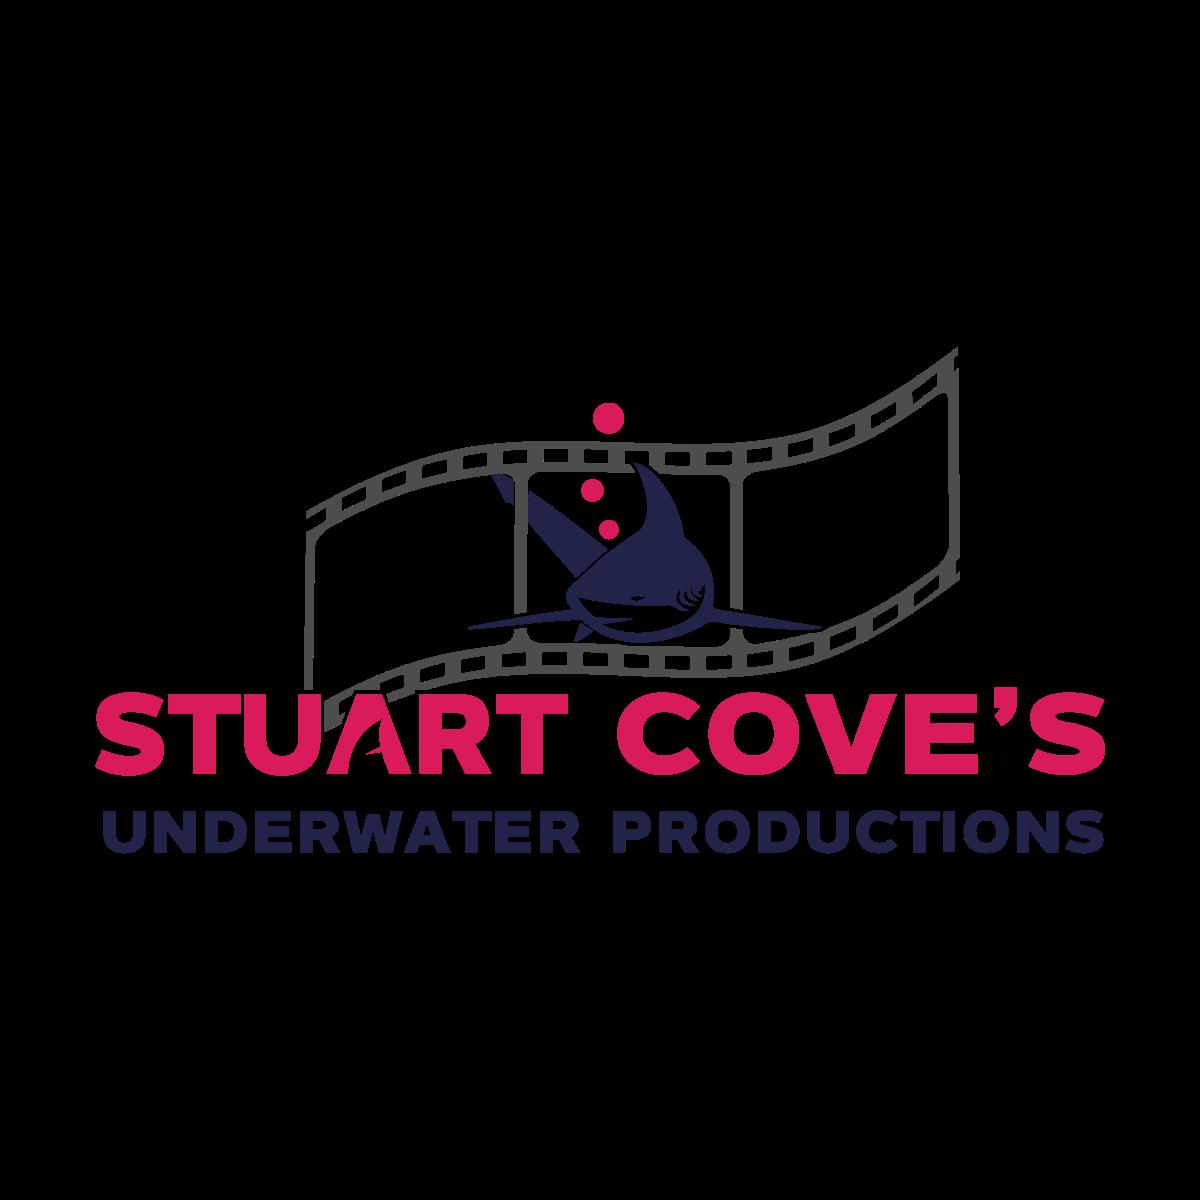 Stuart Cove's Underwater Productions